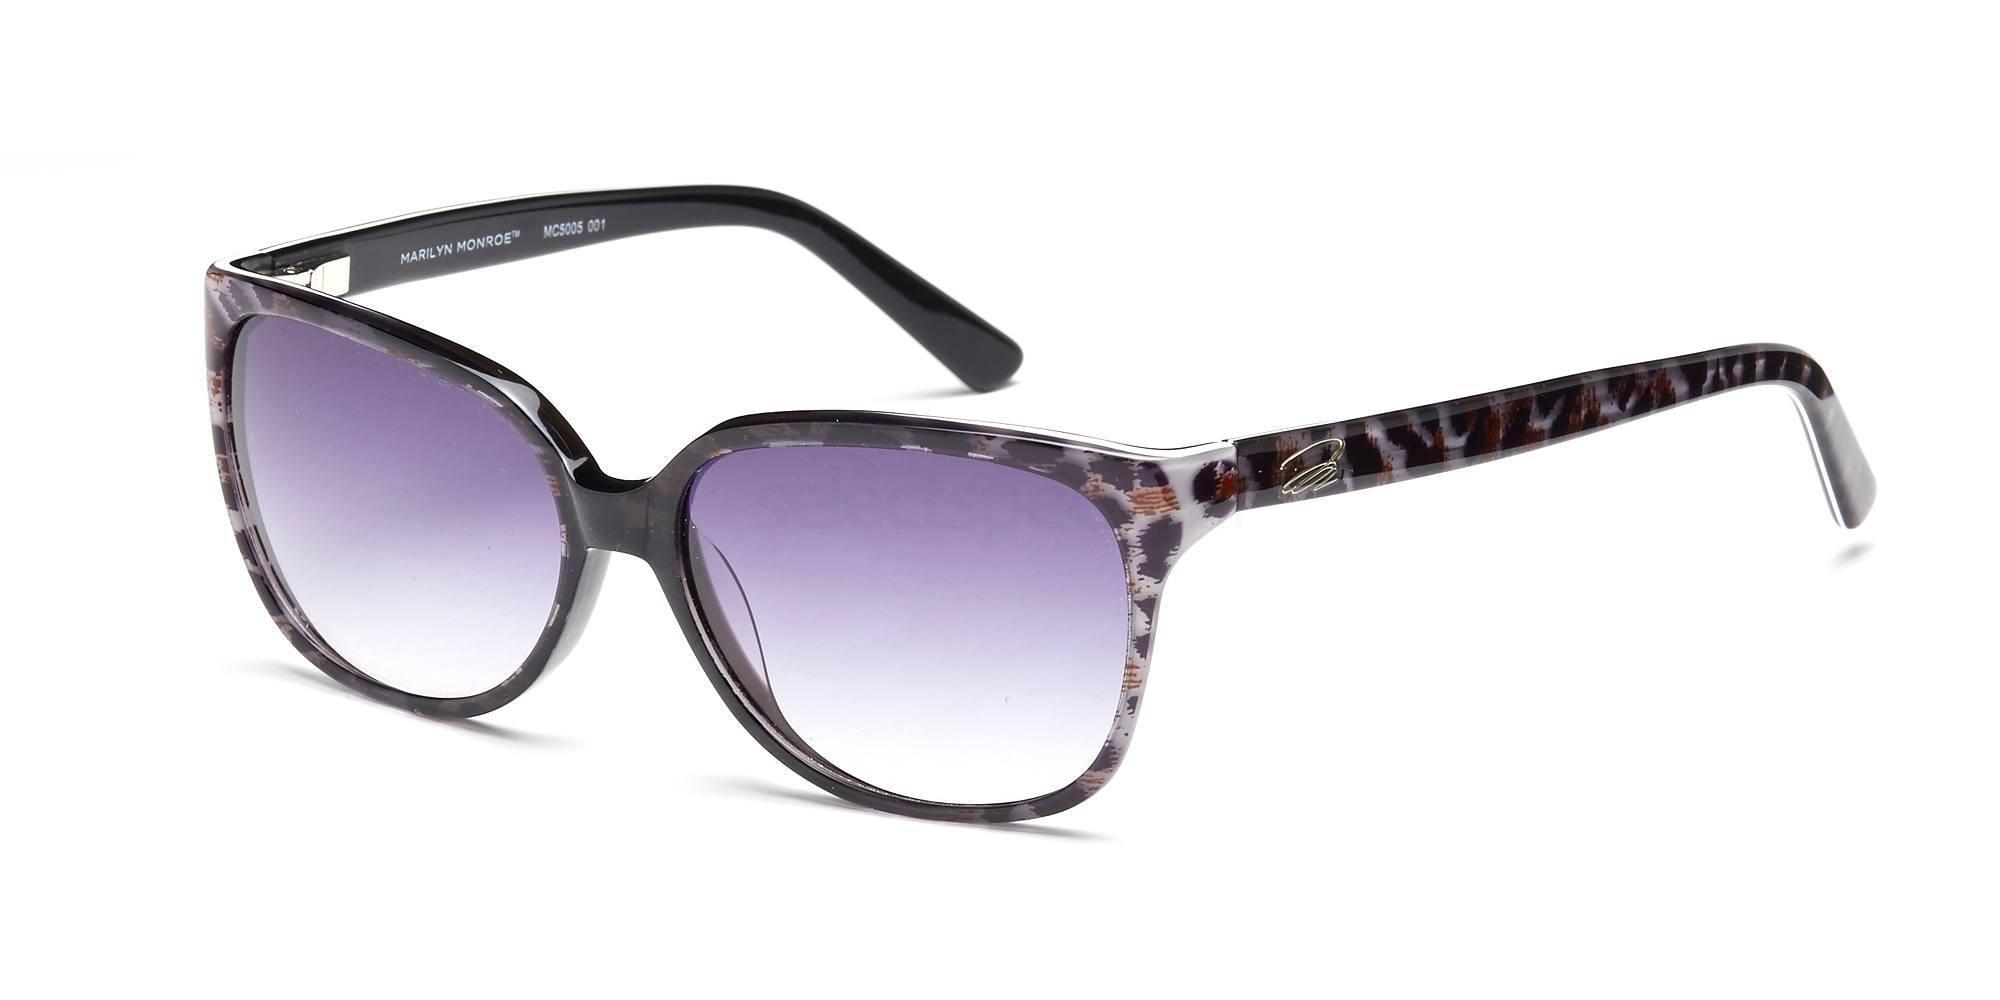 C1 MMS5005 Sunglasses, Marilyn Monroe